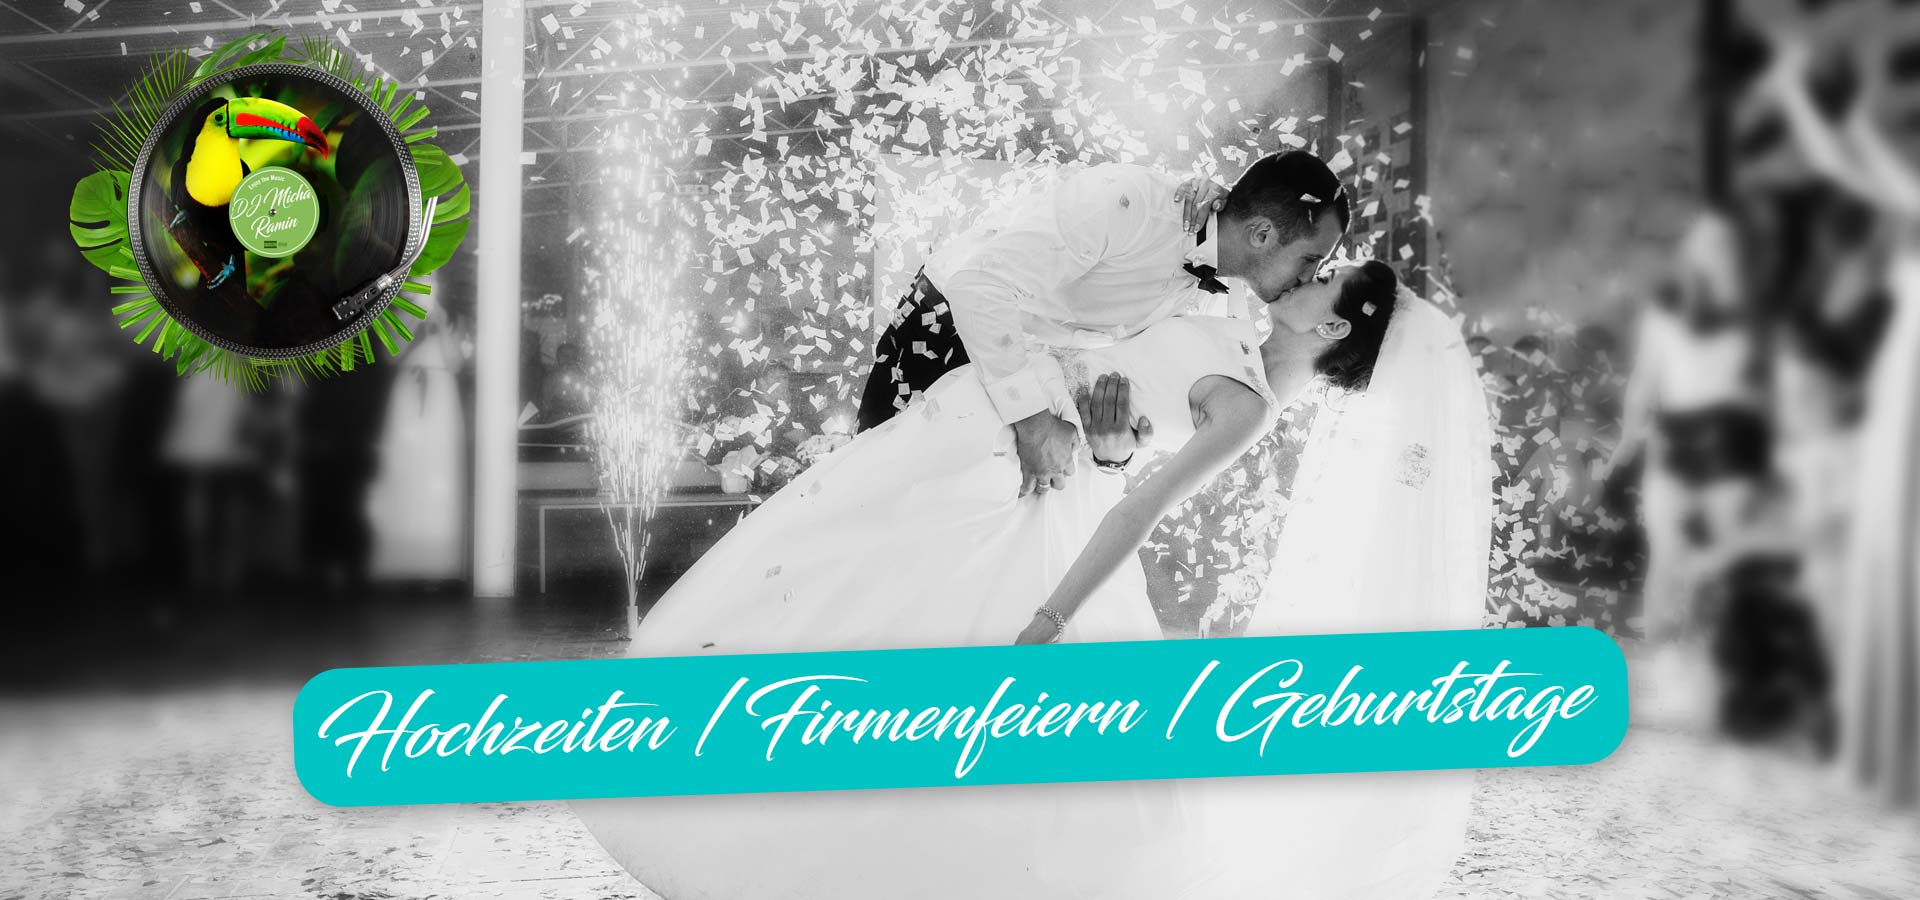 Dj Micha Ramin Ihr Mobiler Dj Berlin Hochzeit Events